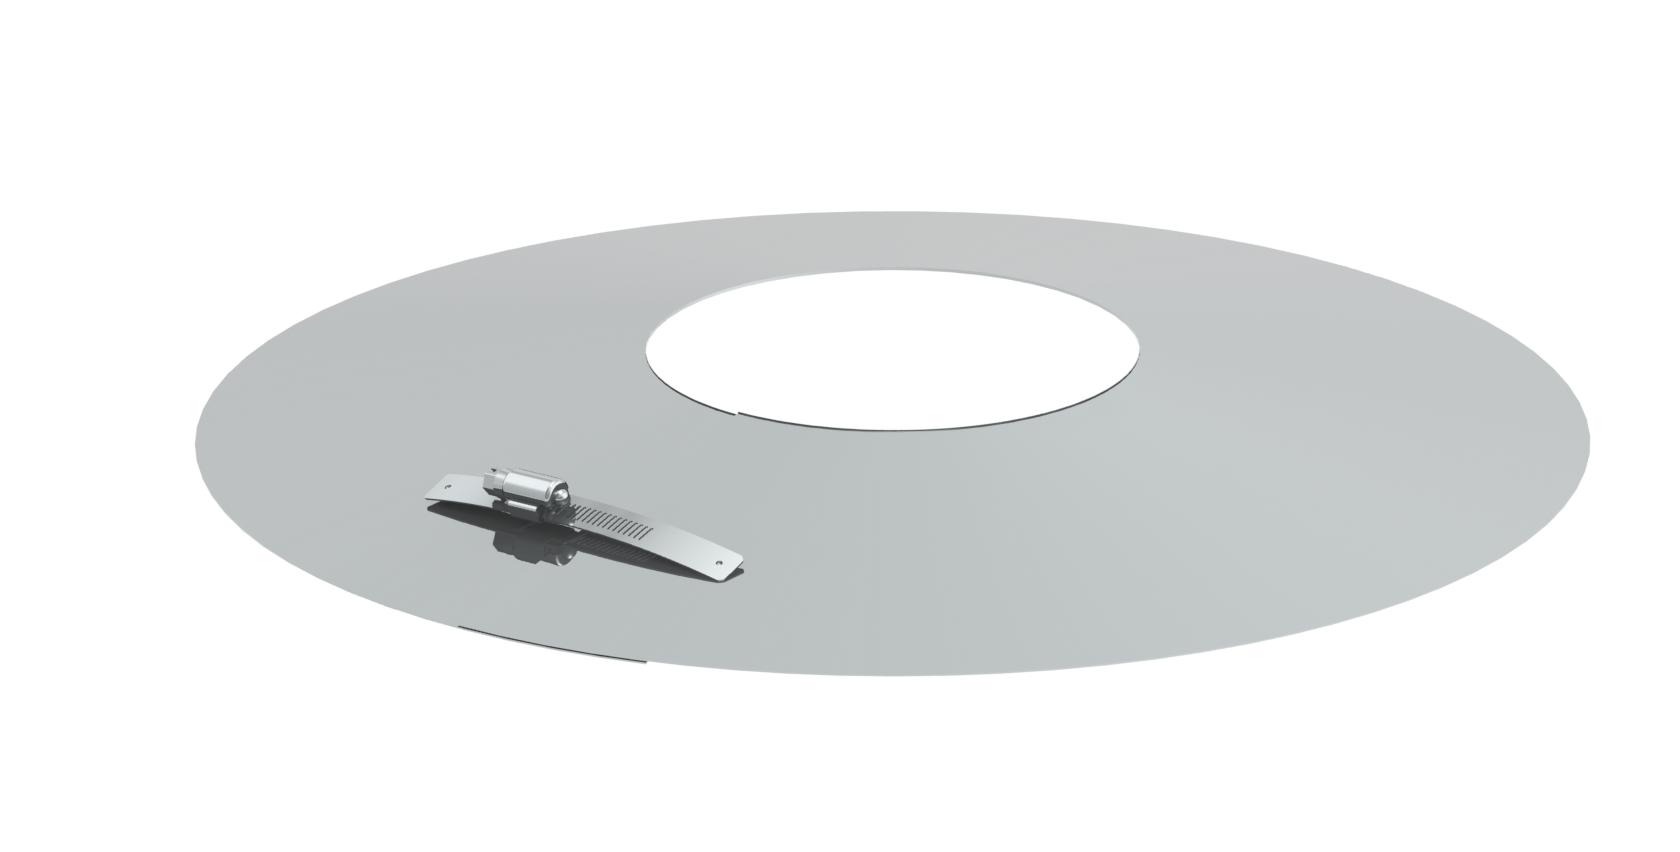 Wandrosette für Tecnovis TWIN-Systeme